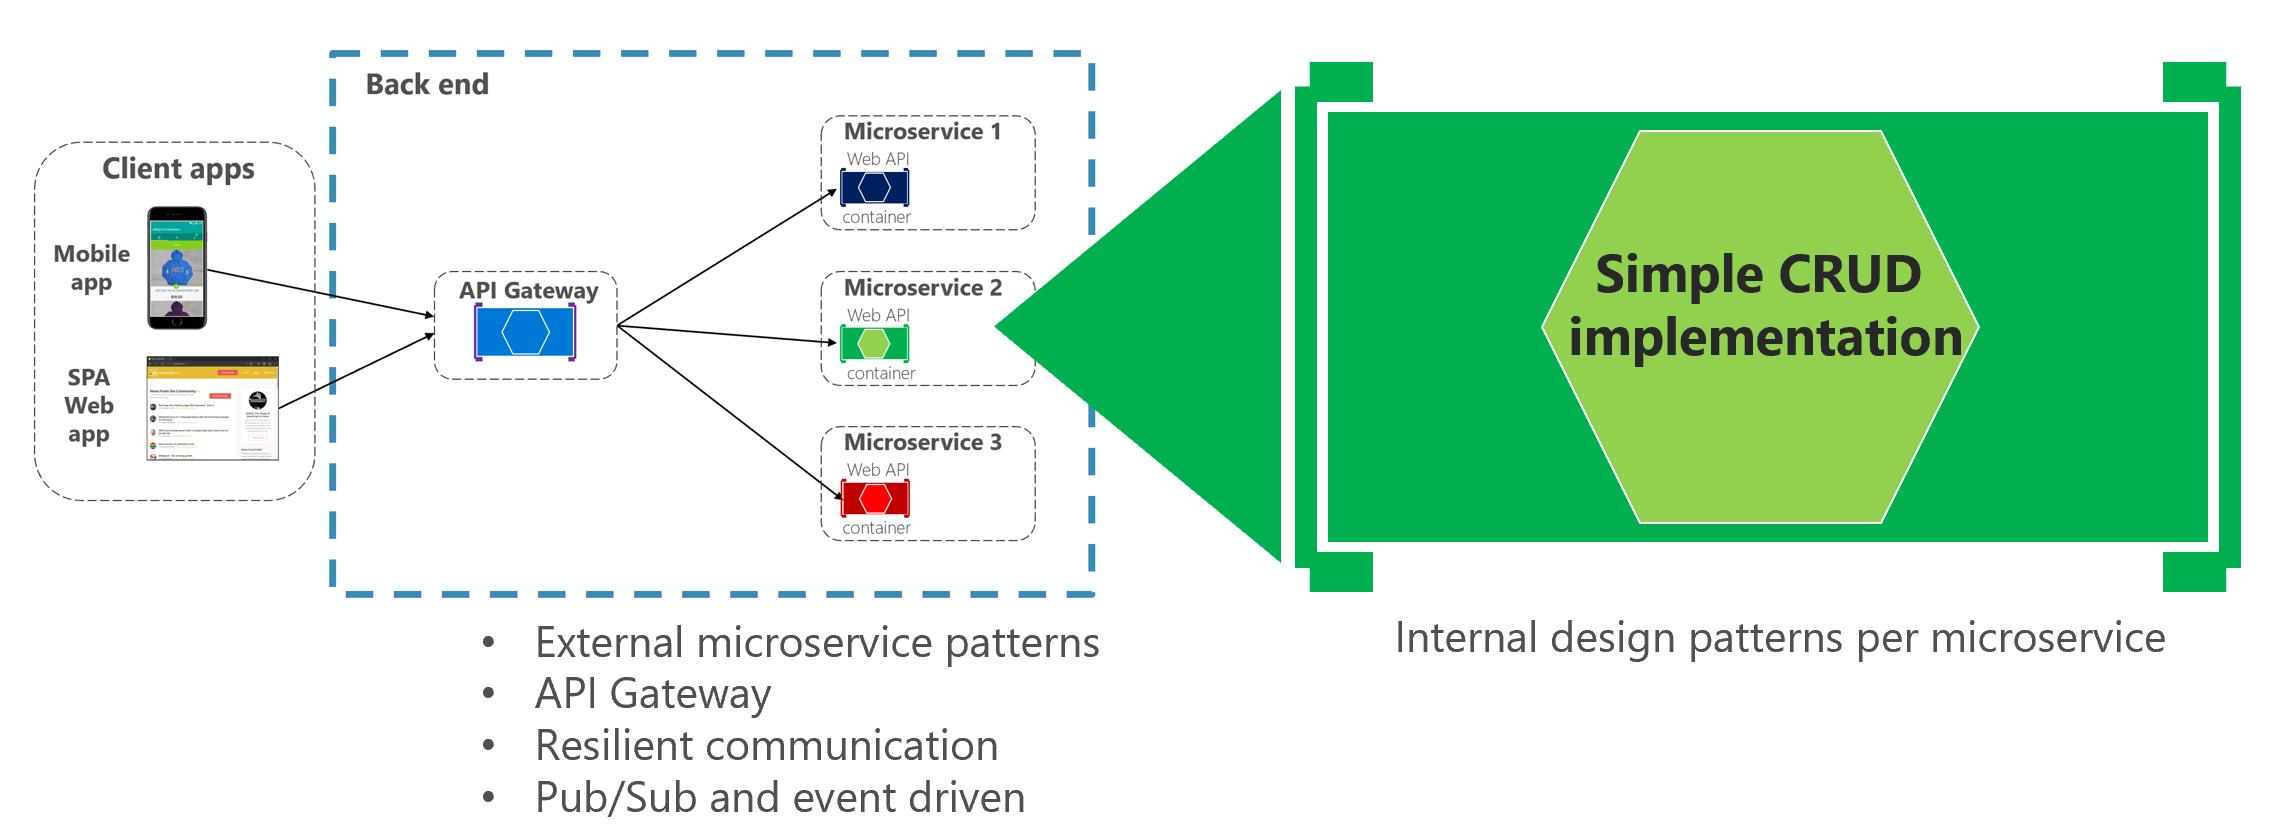 Creating a simple data-driven CRUD microservice | Microsoft Docs